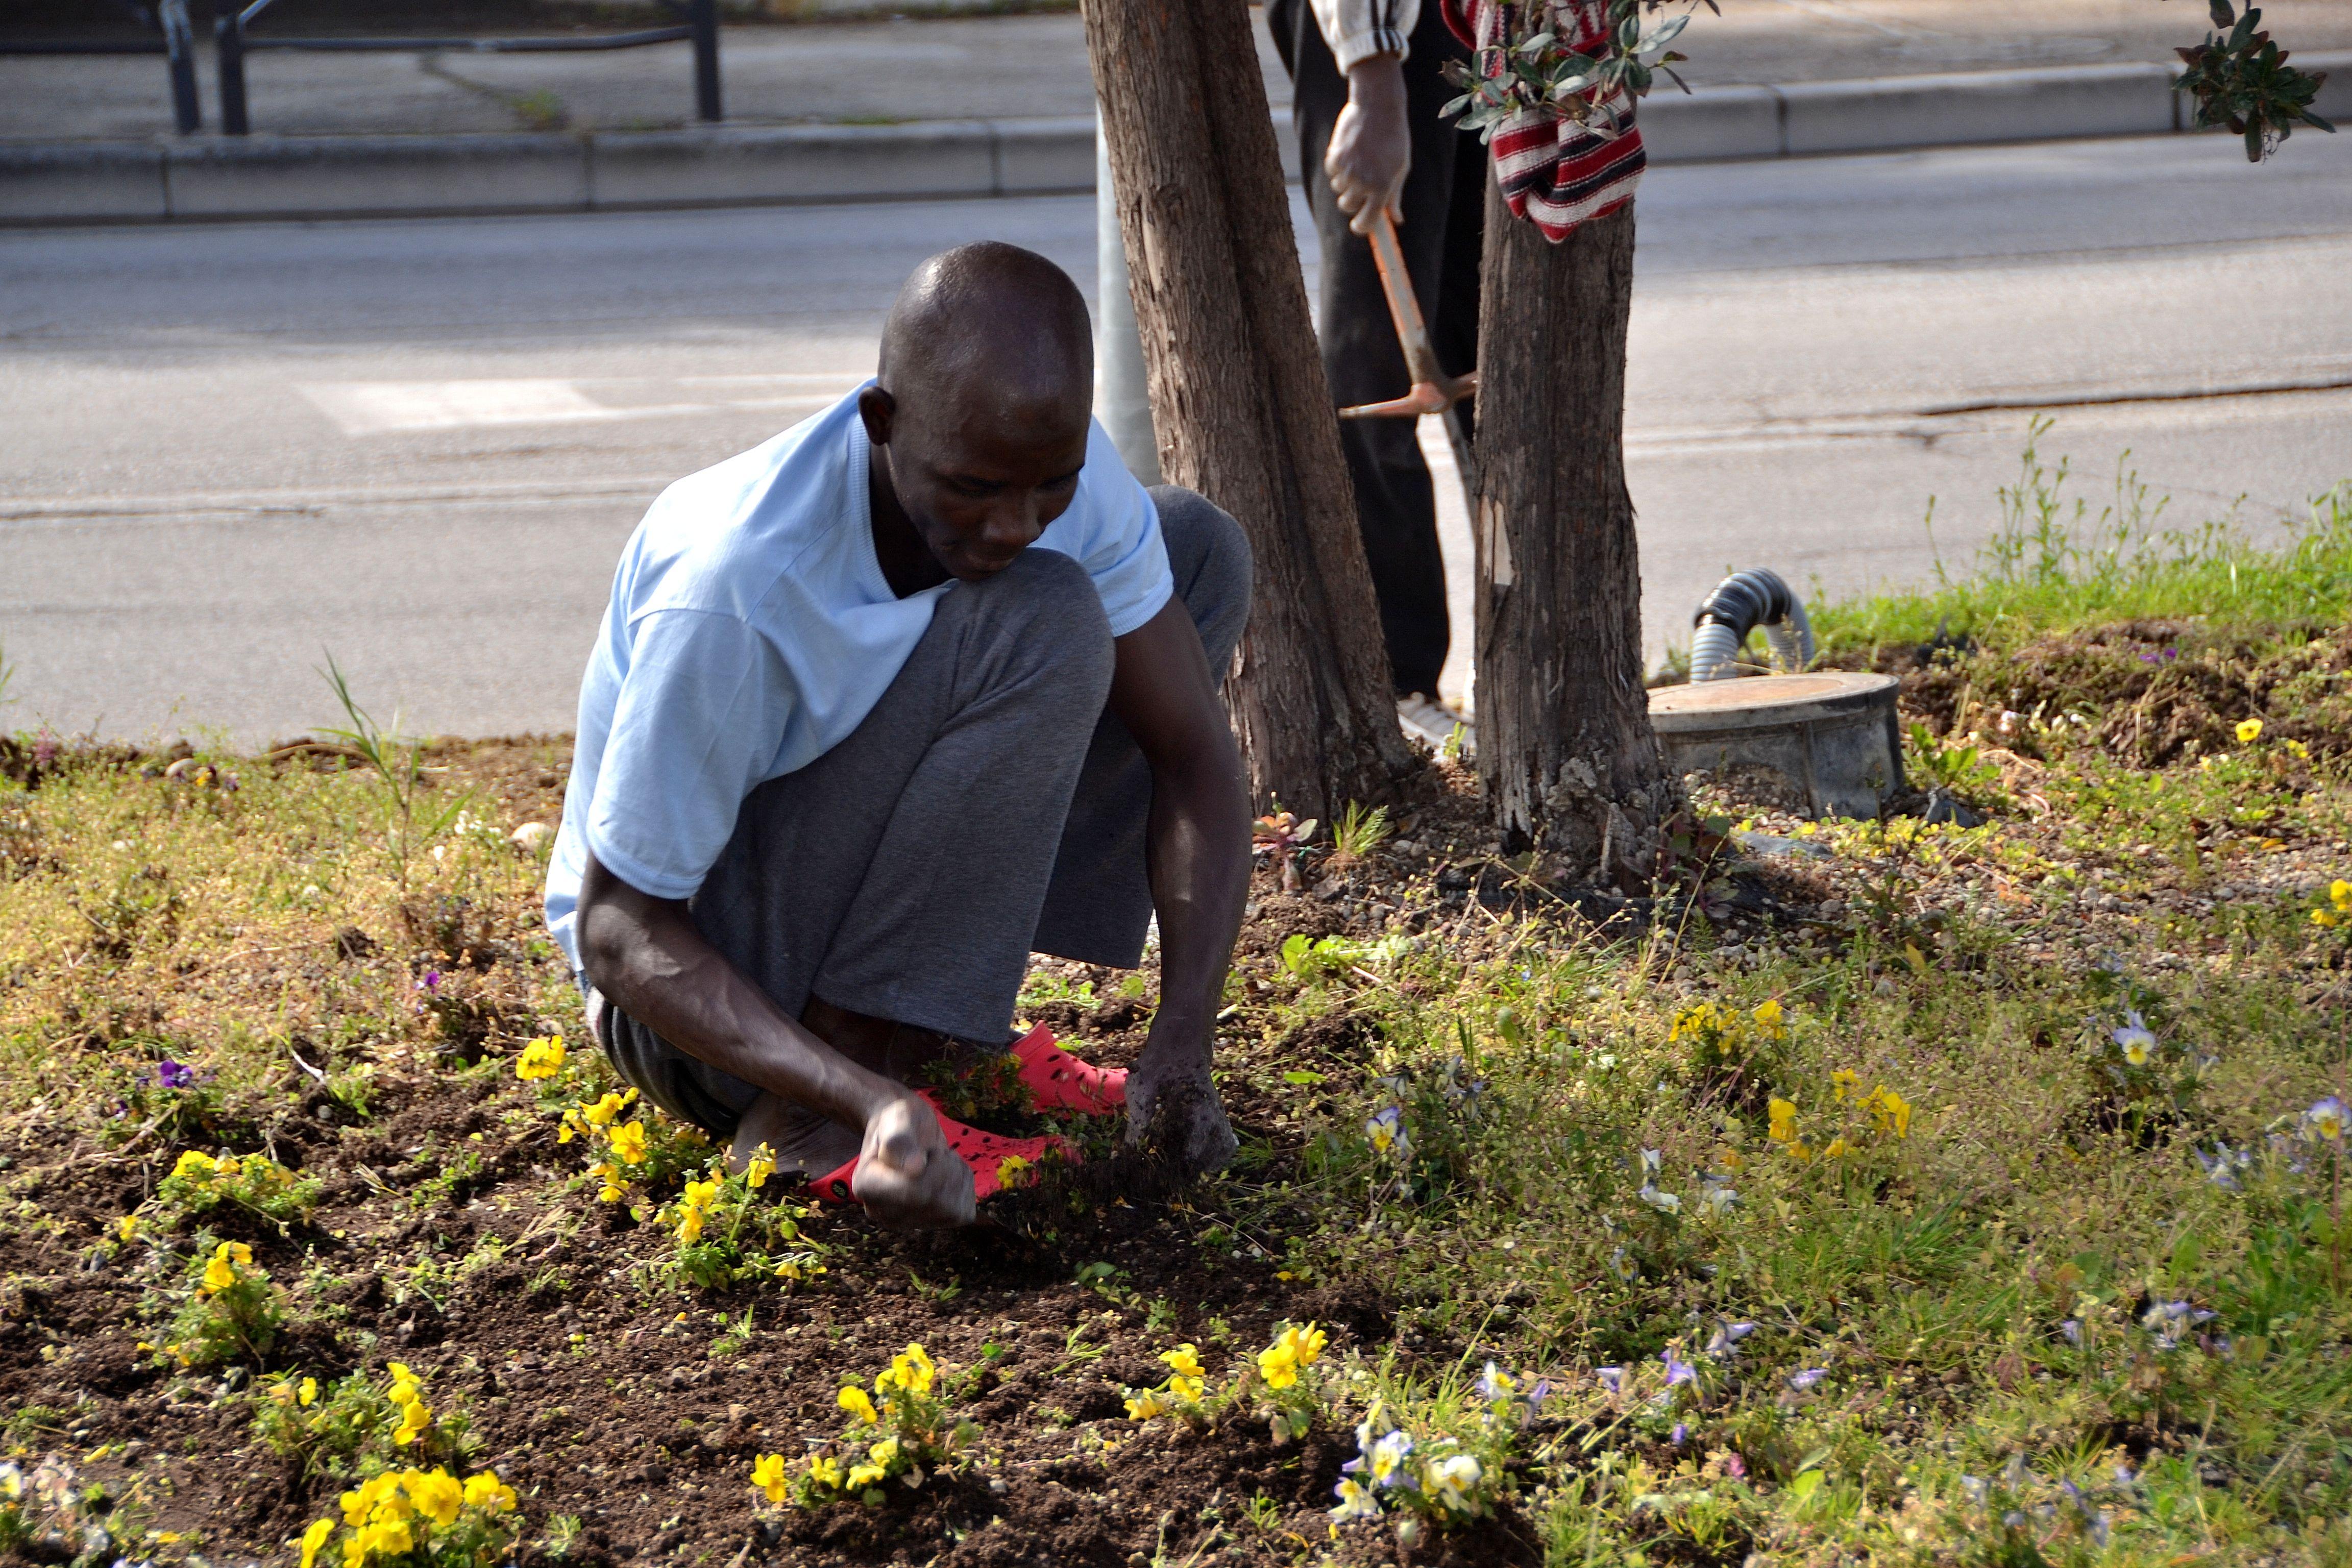 profughi giardinieri